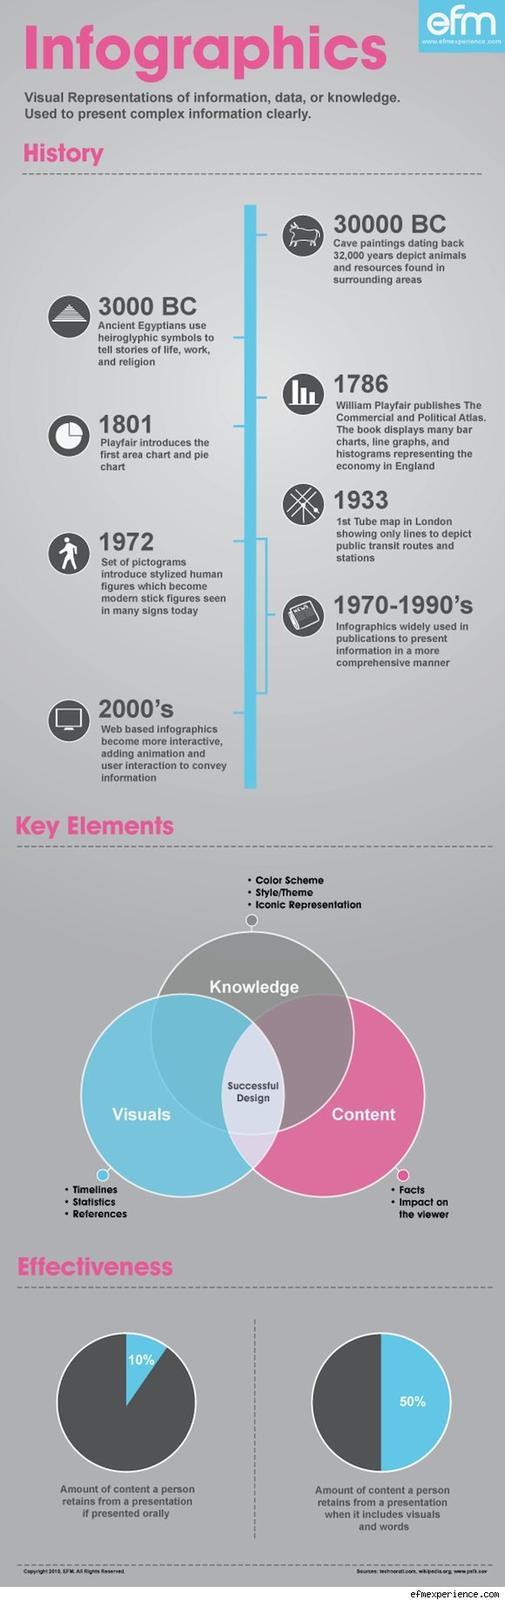 efm-infographic.jpg